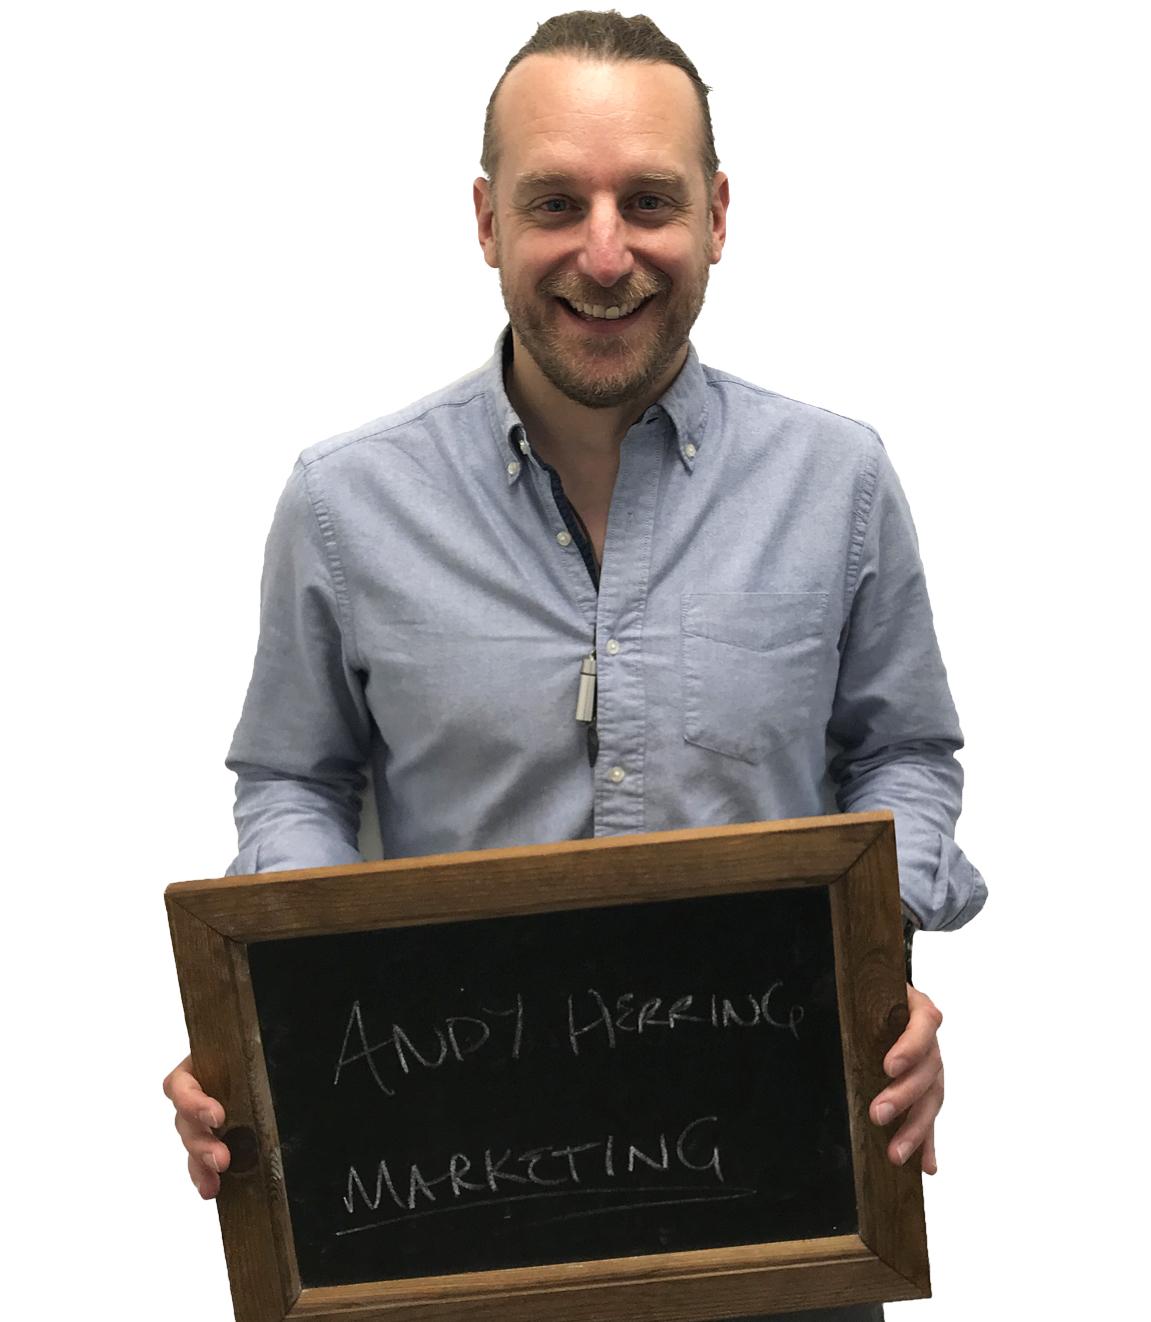 Andy Herring